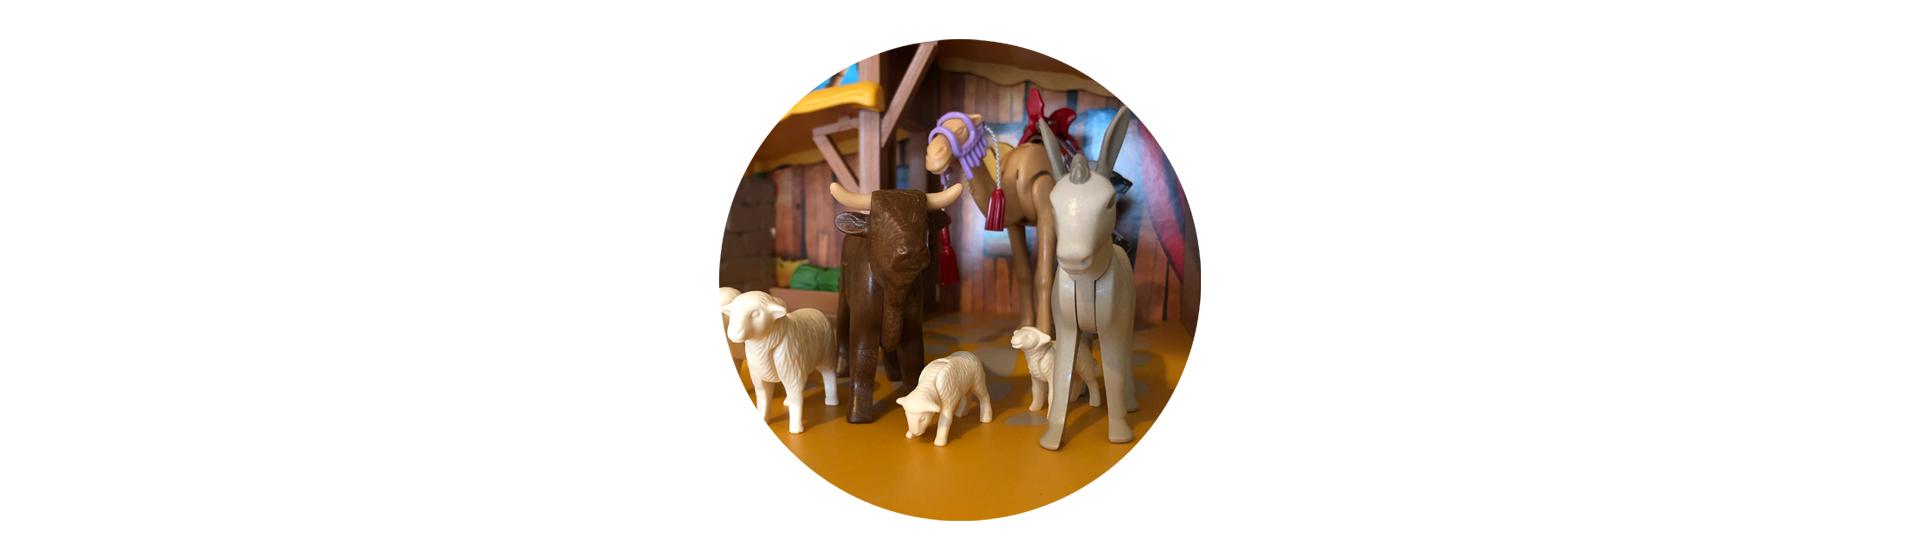 article-thebirthofjesus-playmobile-animals